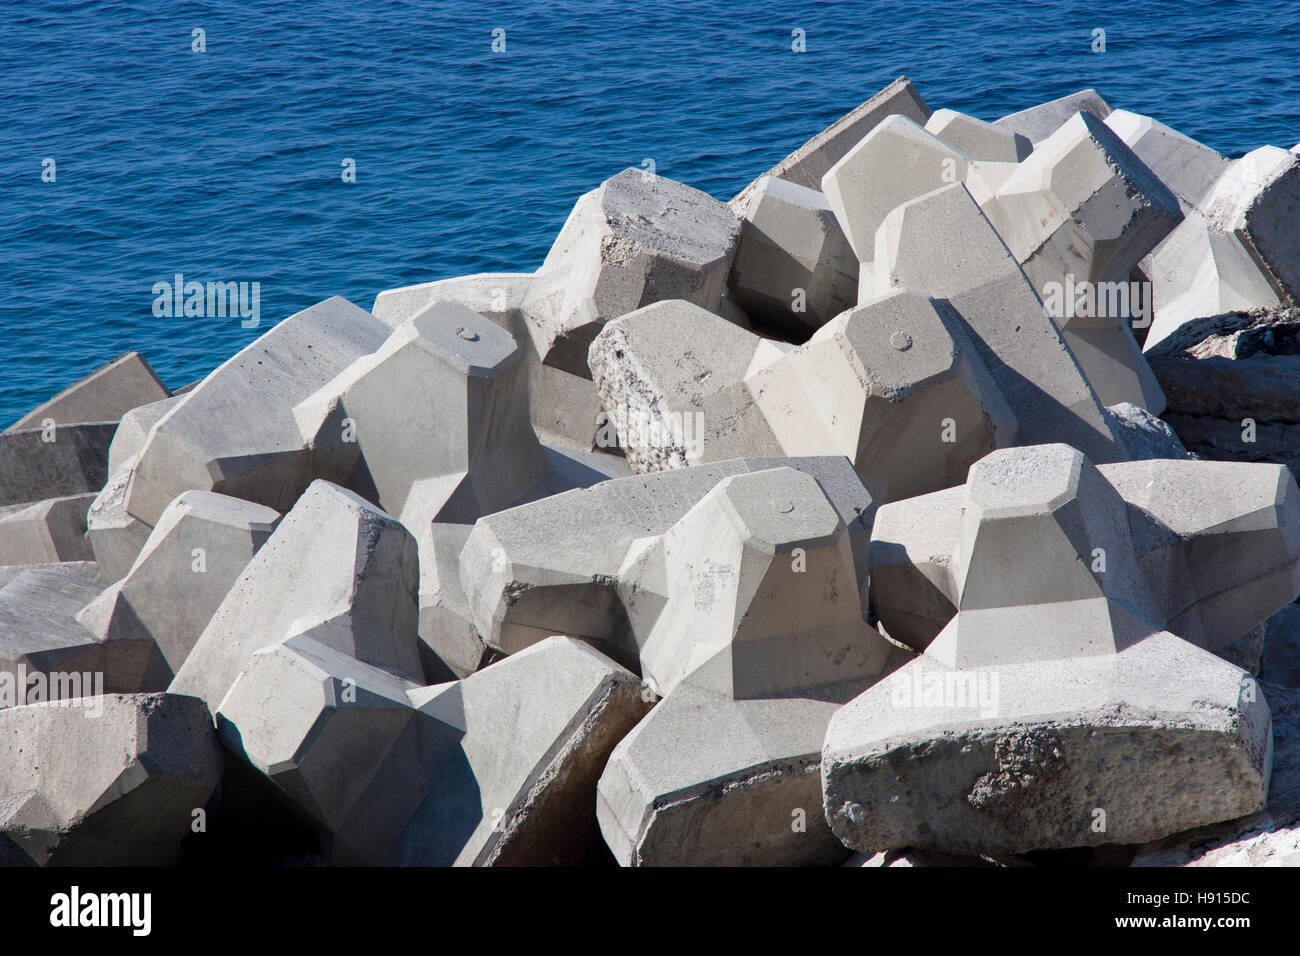 Concrete breakwaters in Adriatic sea - Stock Image